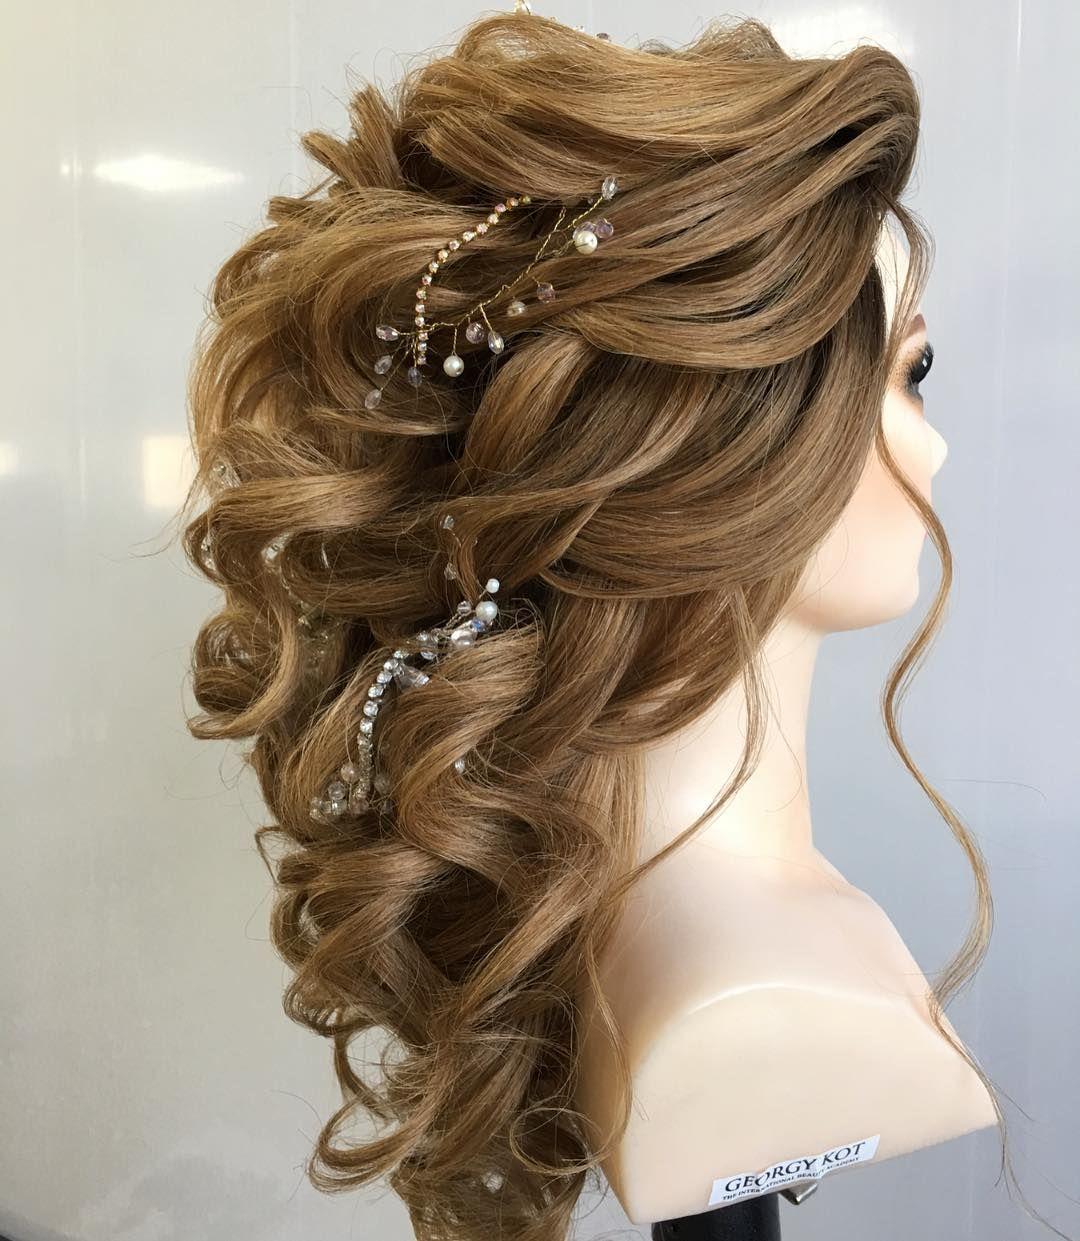 Regardez Cette Photo Instagram De Georgiykot 12 5 K Mentions J Aime Matric Dance Hairstyles Hairdo Wedding Hair Styles